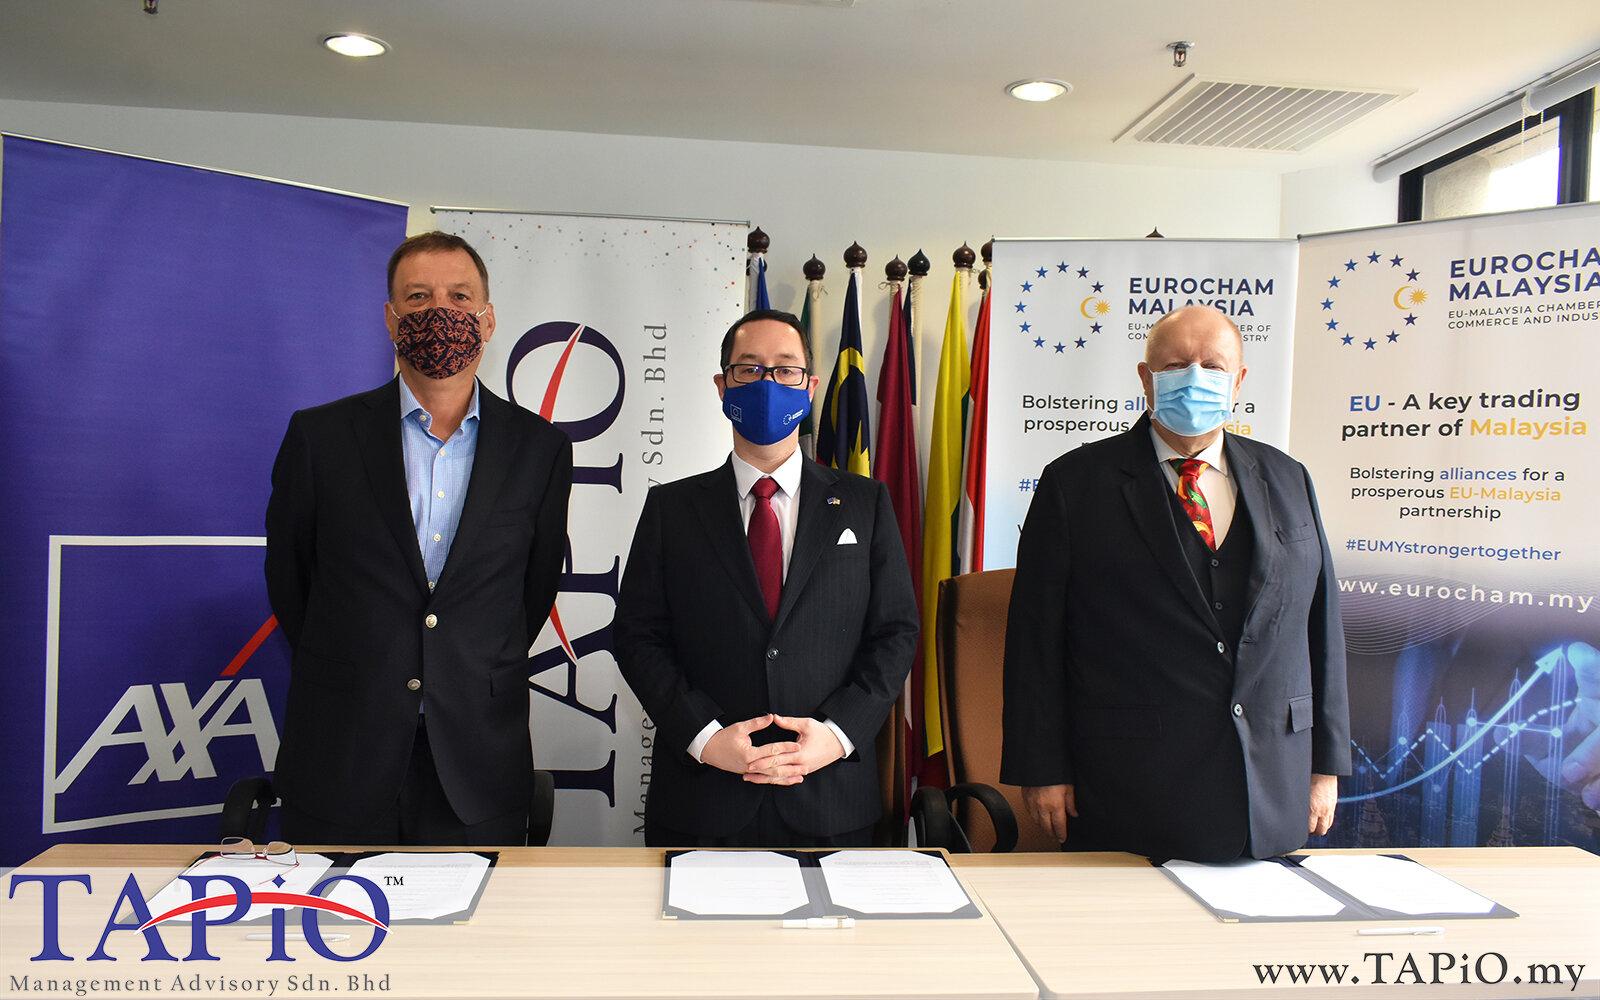 20201005 - Signing Ceremony between EUROCHAM. AXA and TAPiO